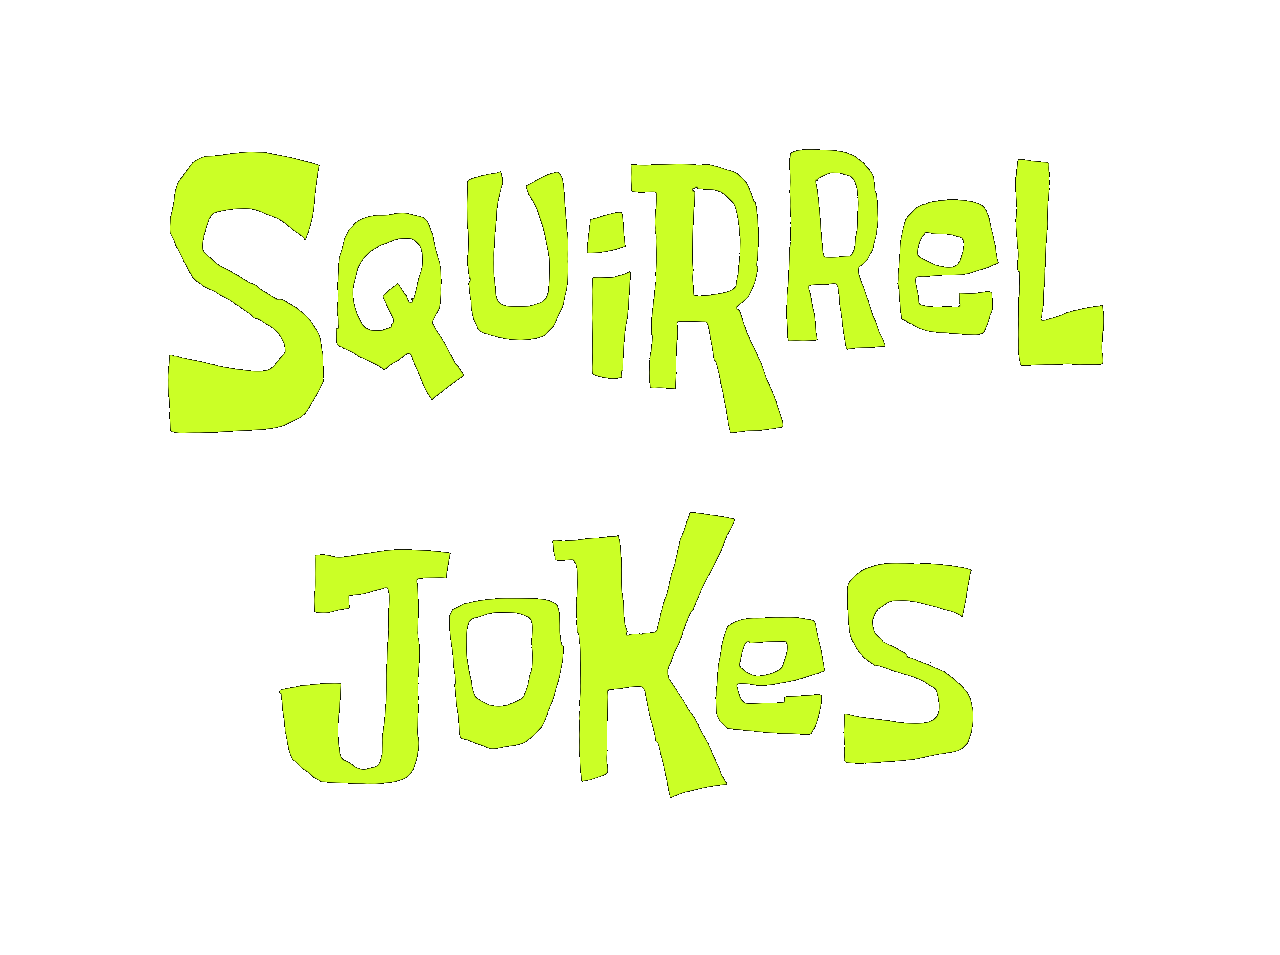 Squirrel Jokes text